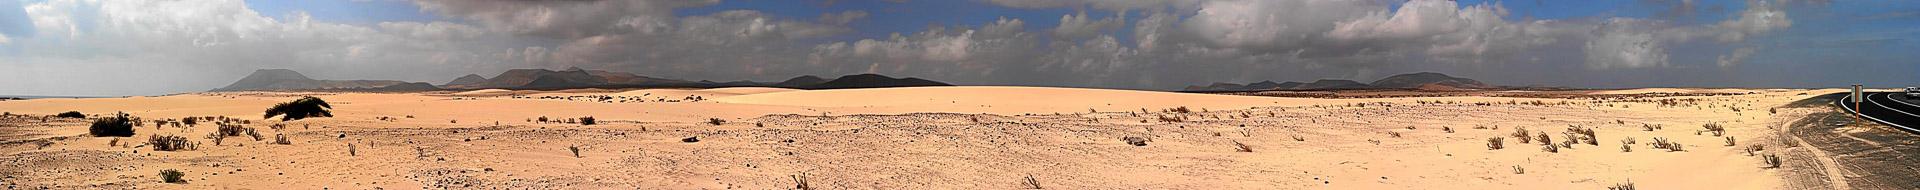 Fuerteventura: Dünen von Corralejo